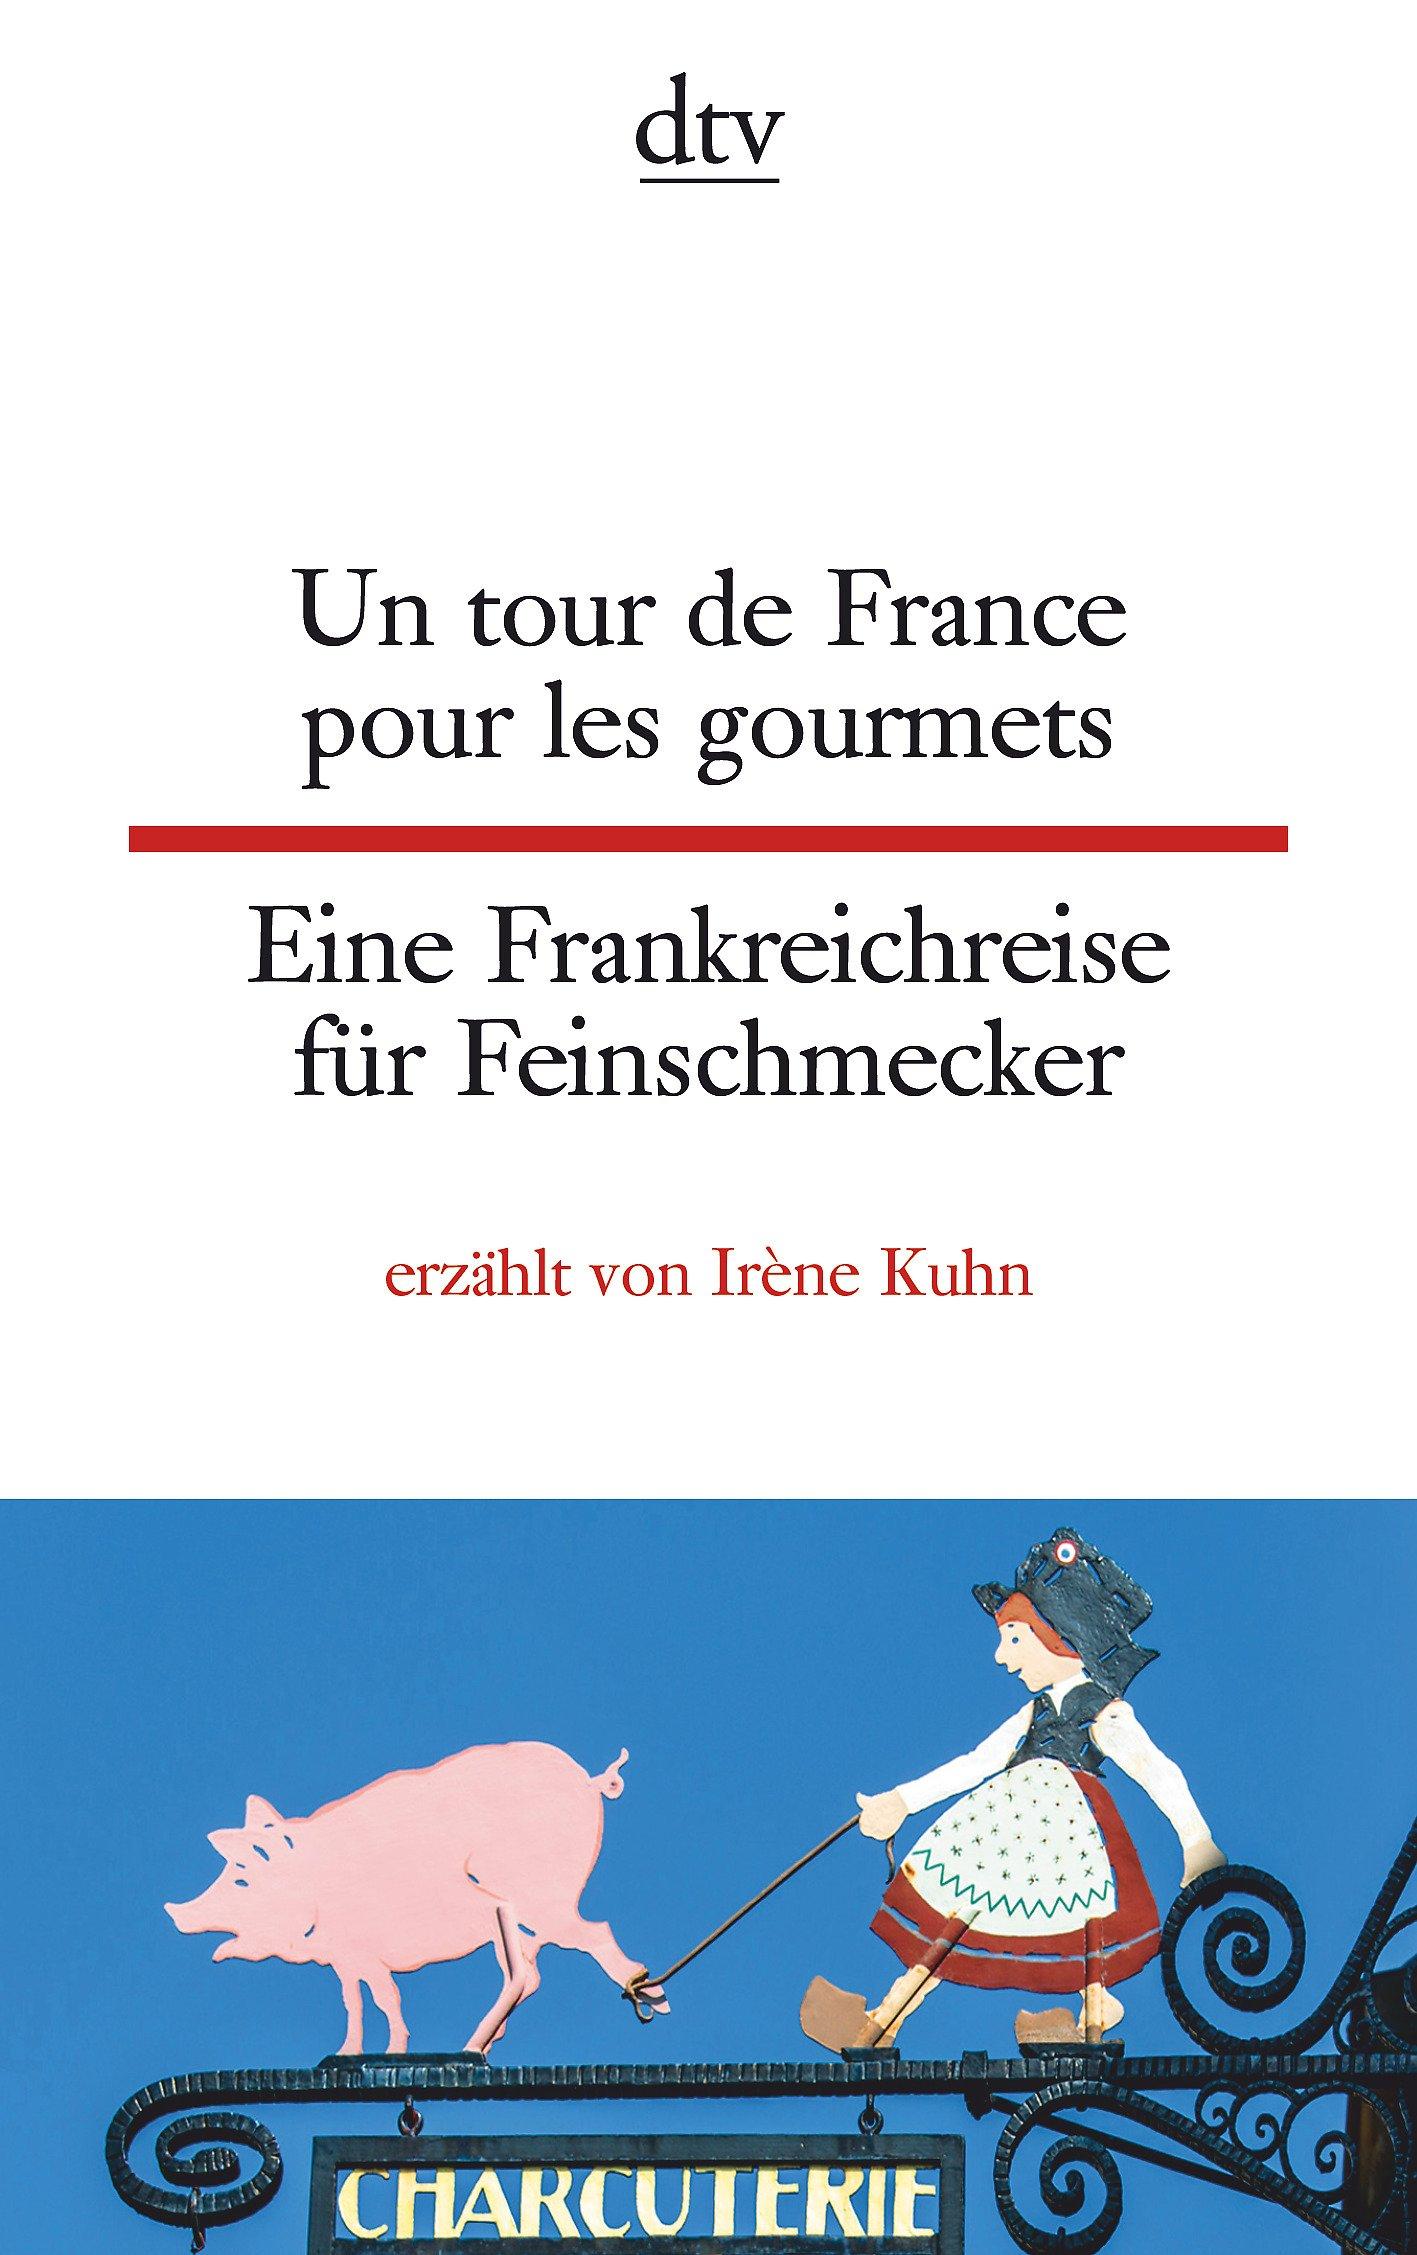 un-tour-de-france-pour-les-gourmets-eine-frankreichreise-fr-feinschmecker-dtv-zweisprachig